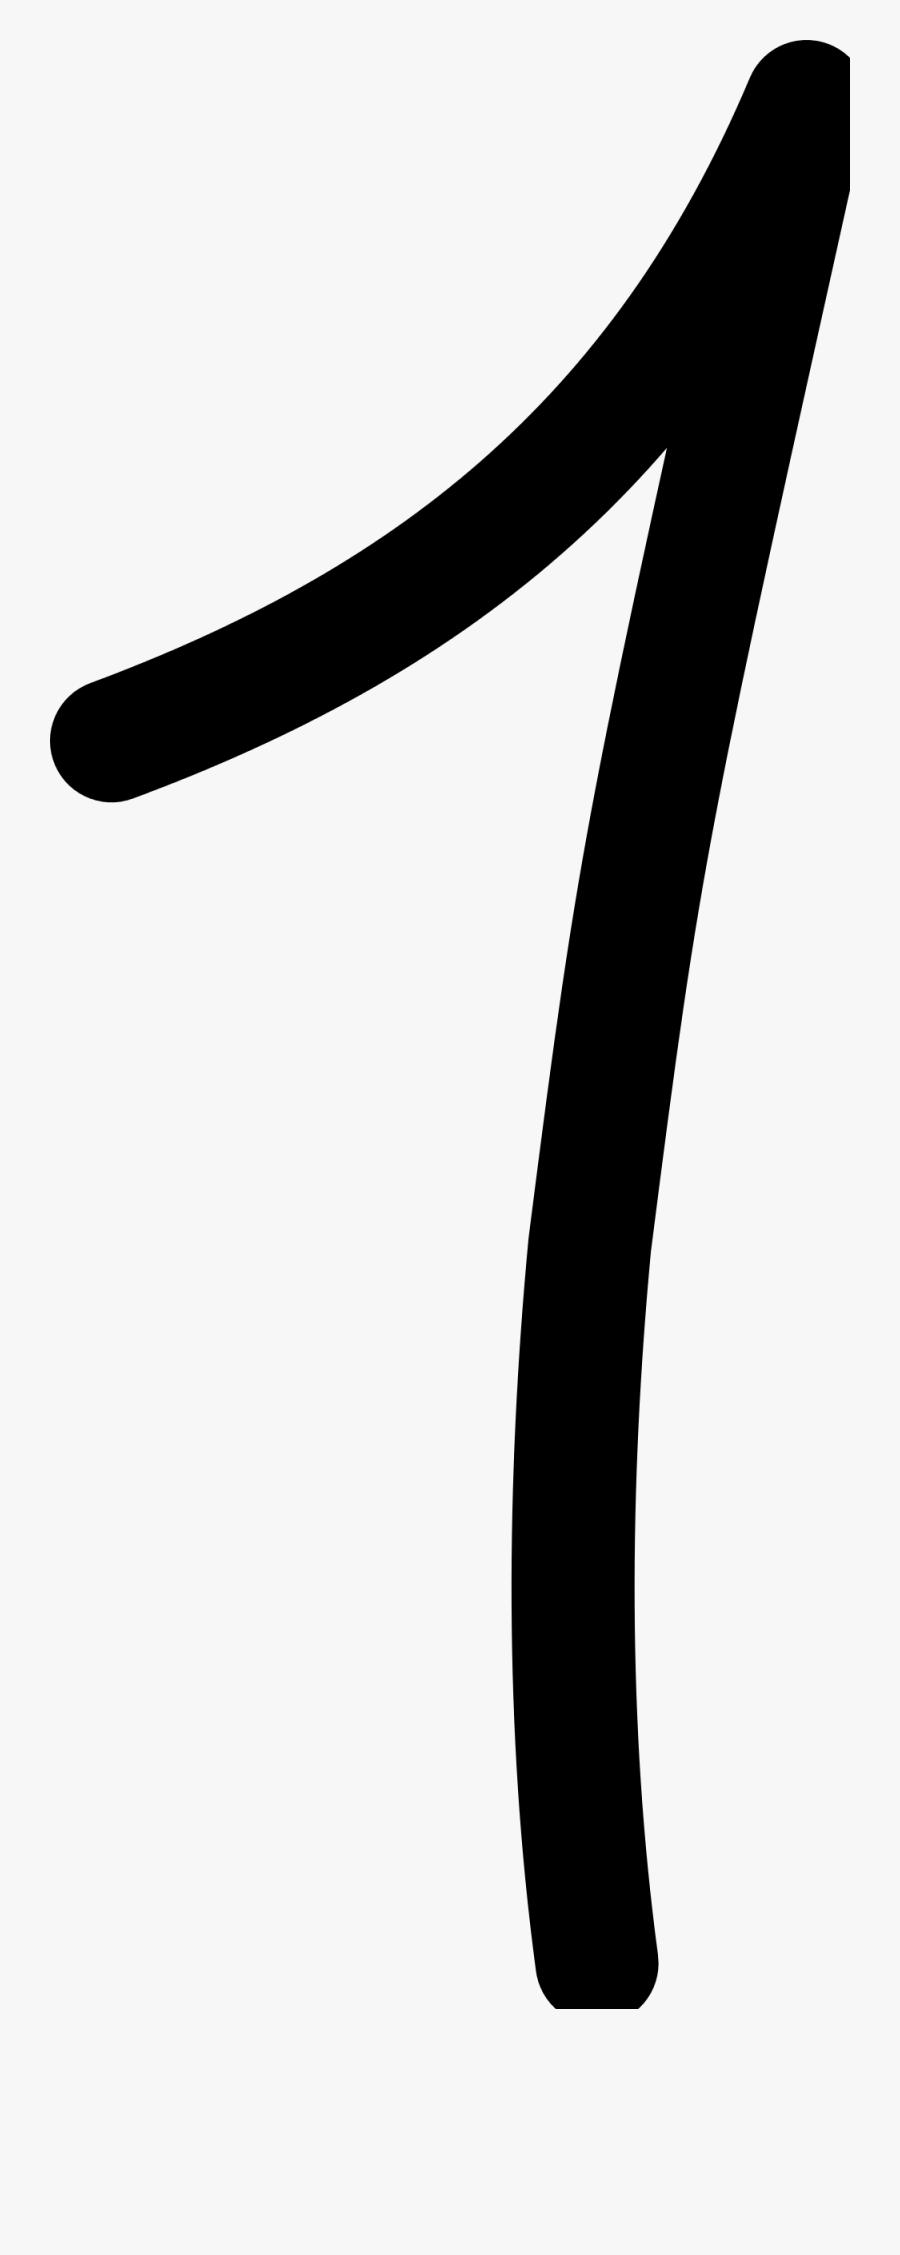 1 Clipart Transparent Png - Number One 1 Transparent Background, Transparent Clipart